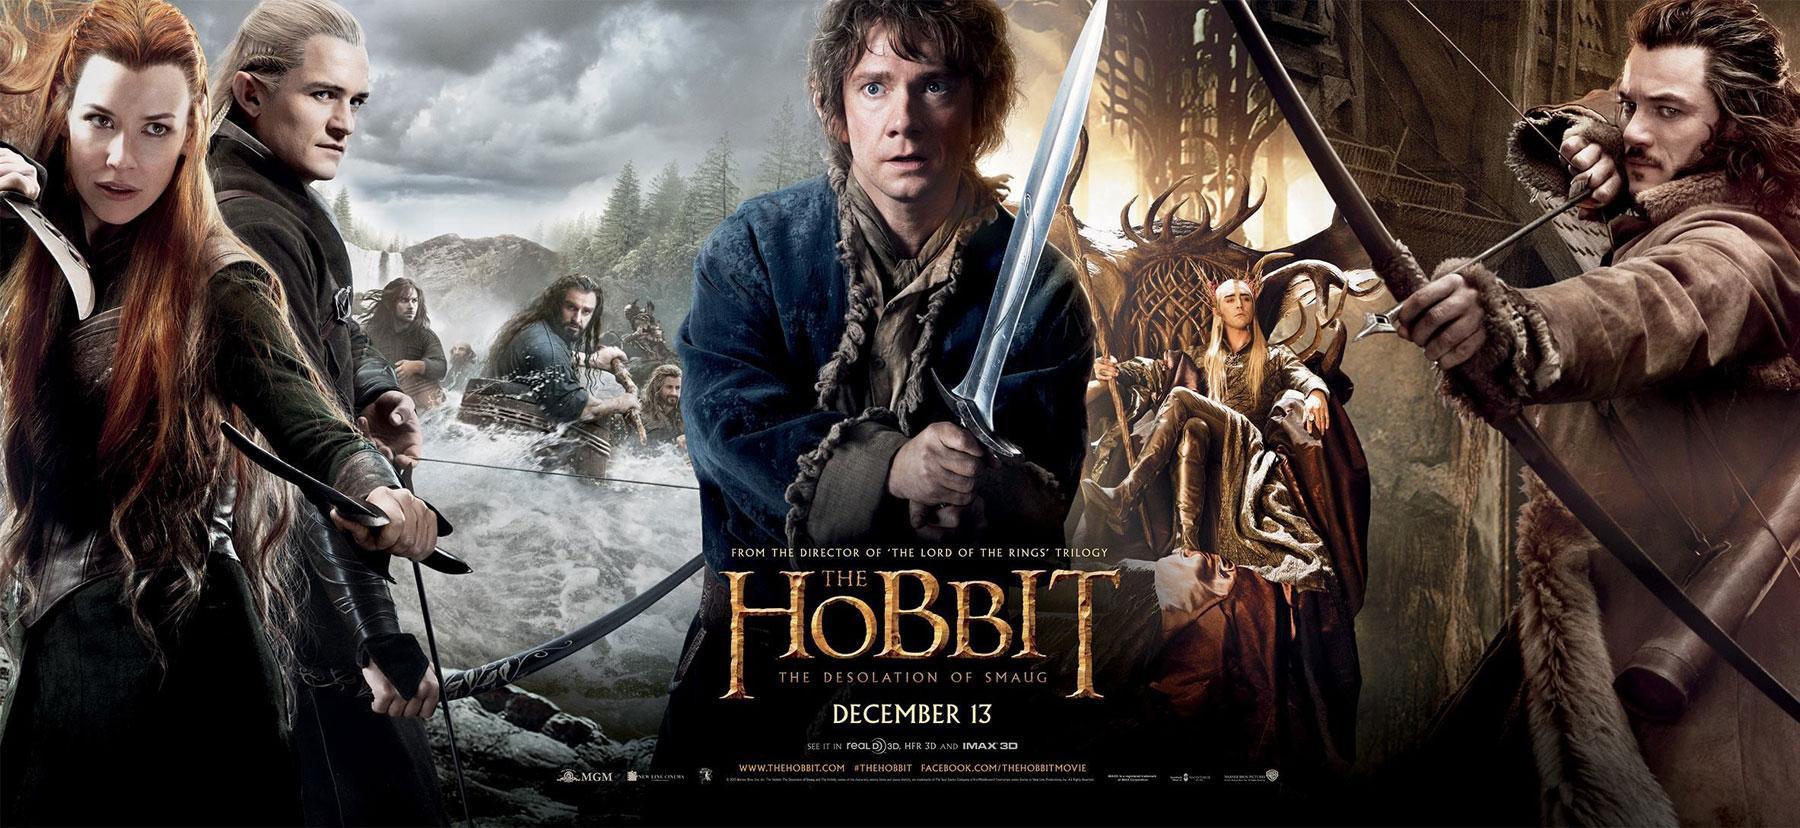 'Hobbit' Bloopers, Beorn's Massive House Sneak Peek and